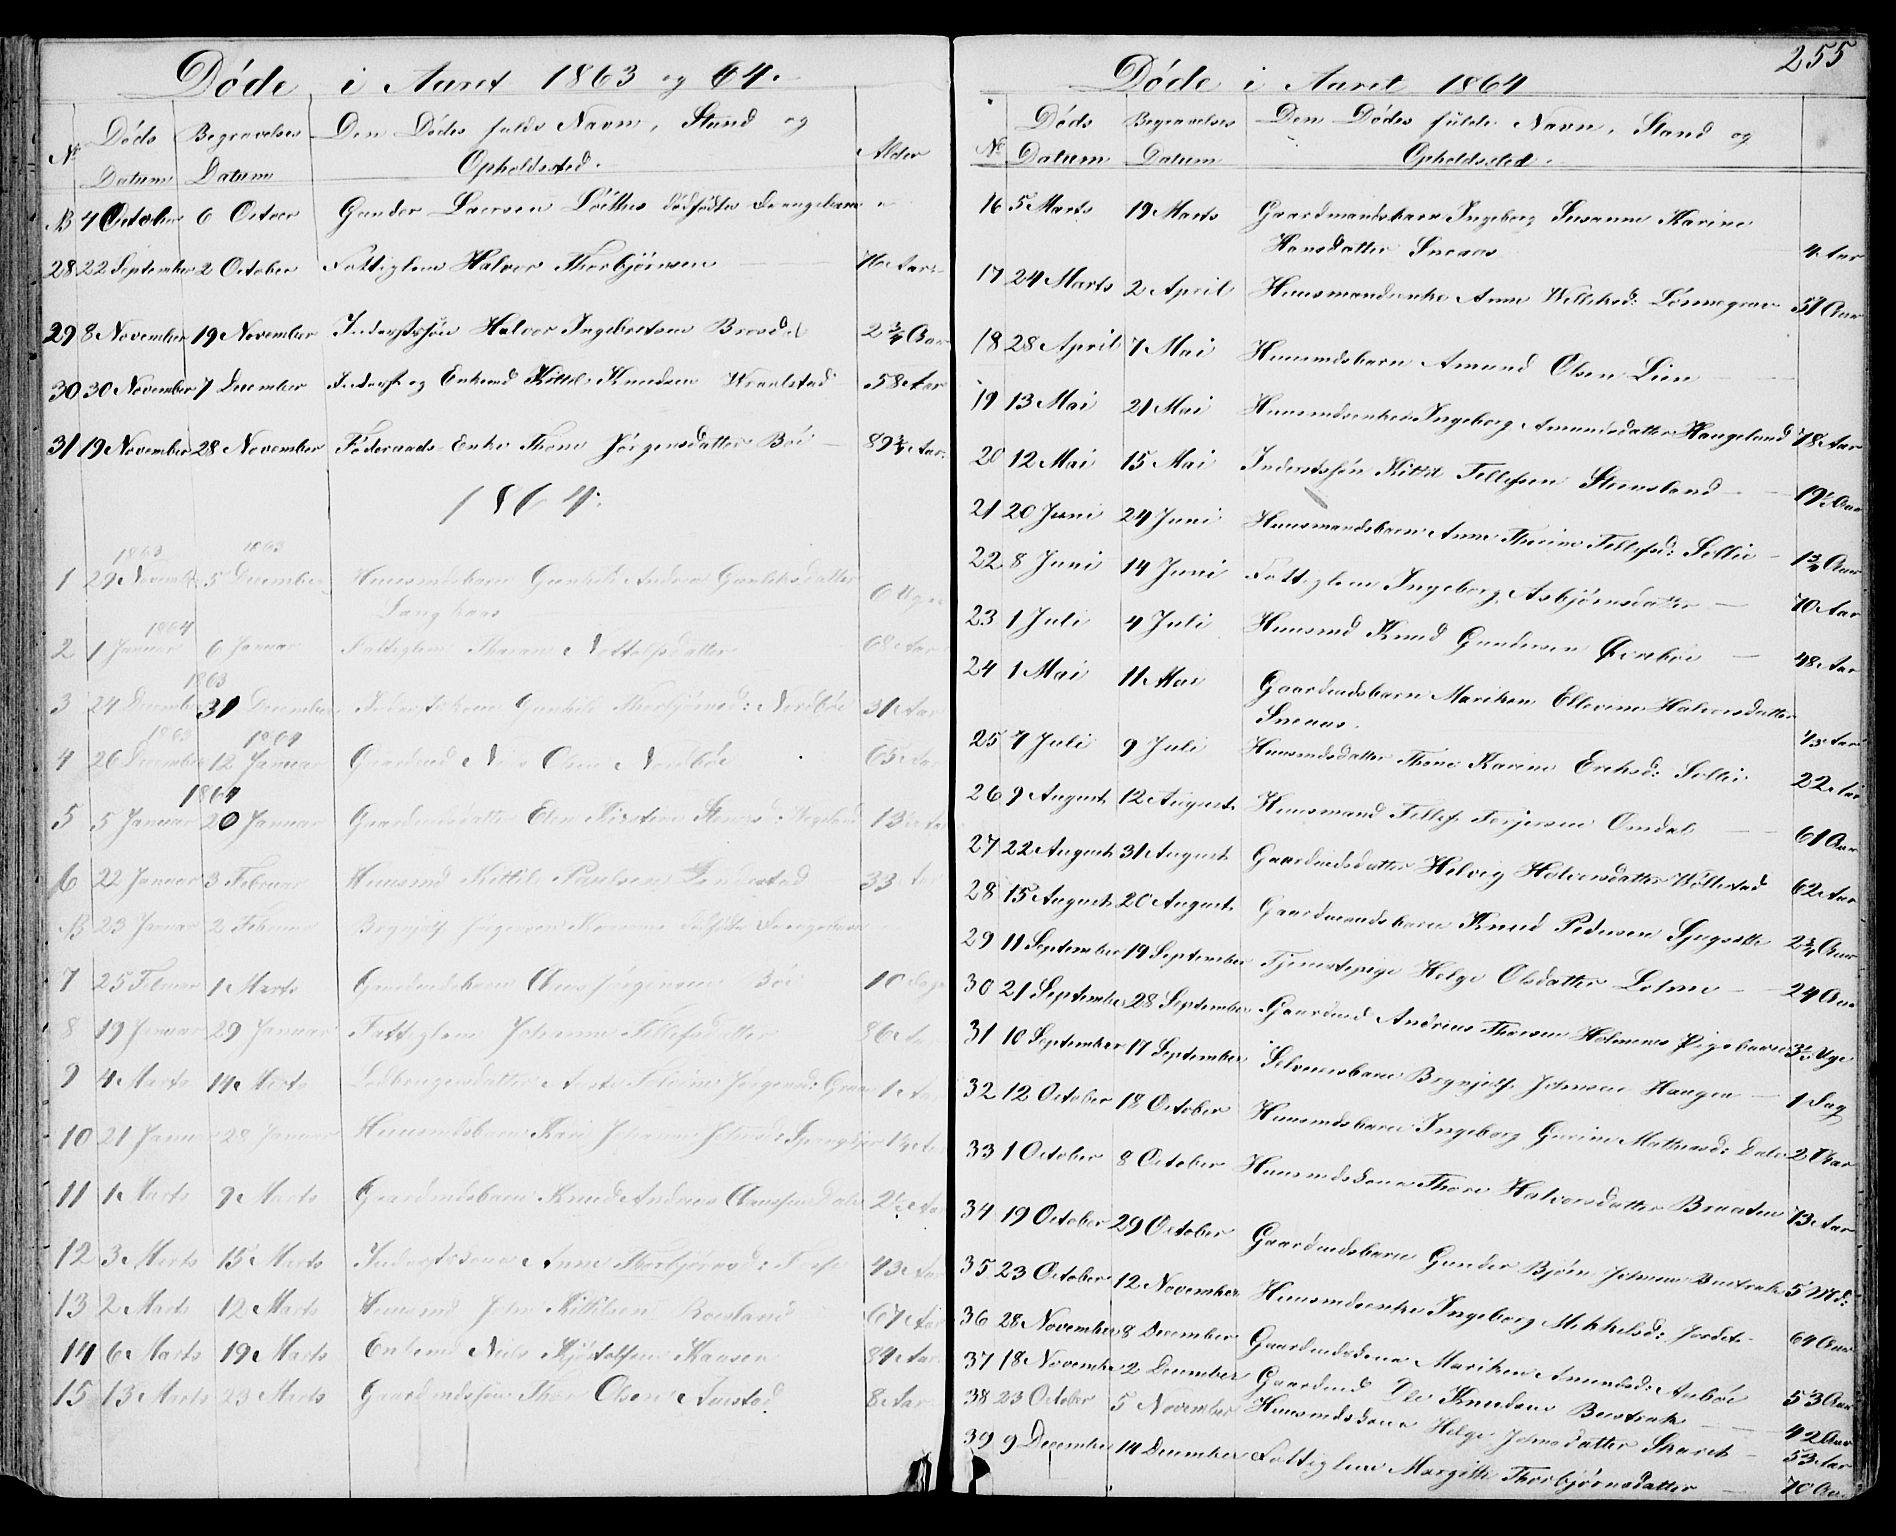 SAKO, Drangedal kirkebøker, G/Gb/L0001: Klokkerbok nr. II 1, 1856-1894, s. 255